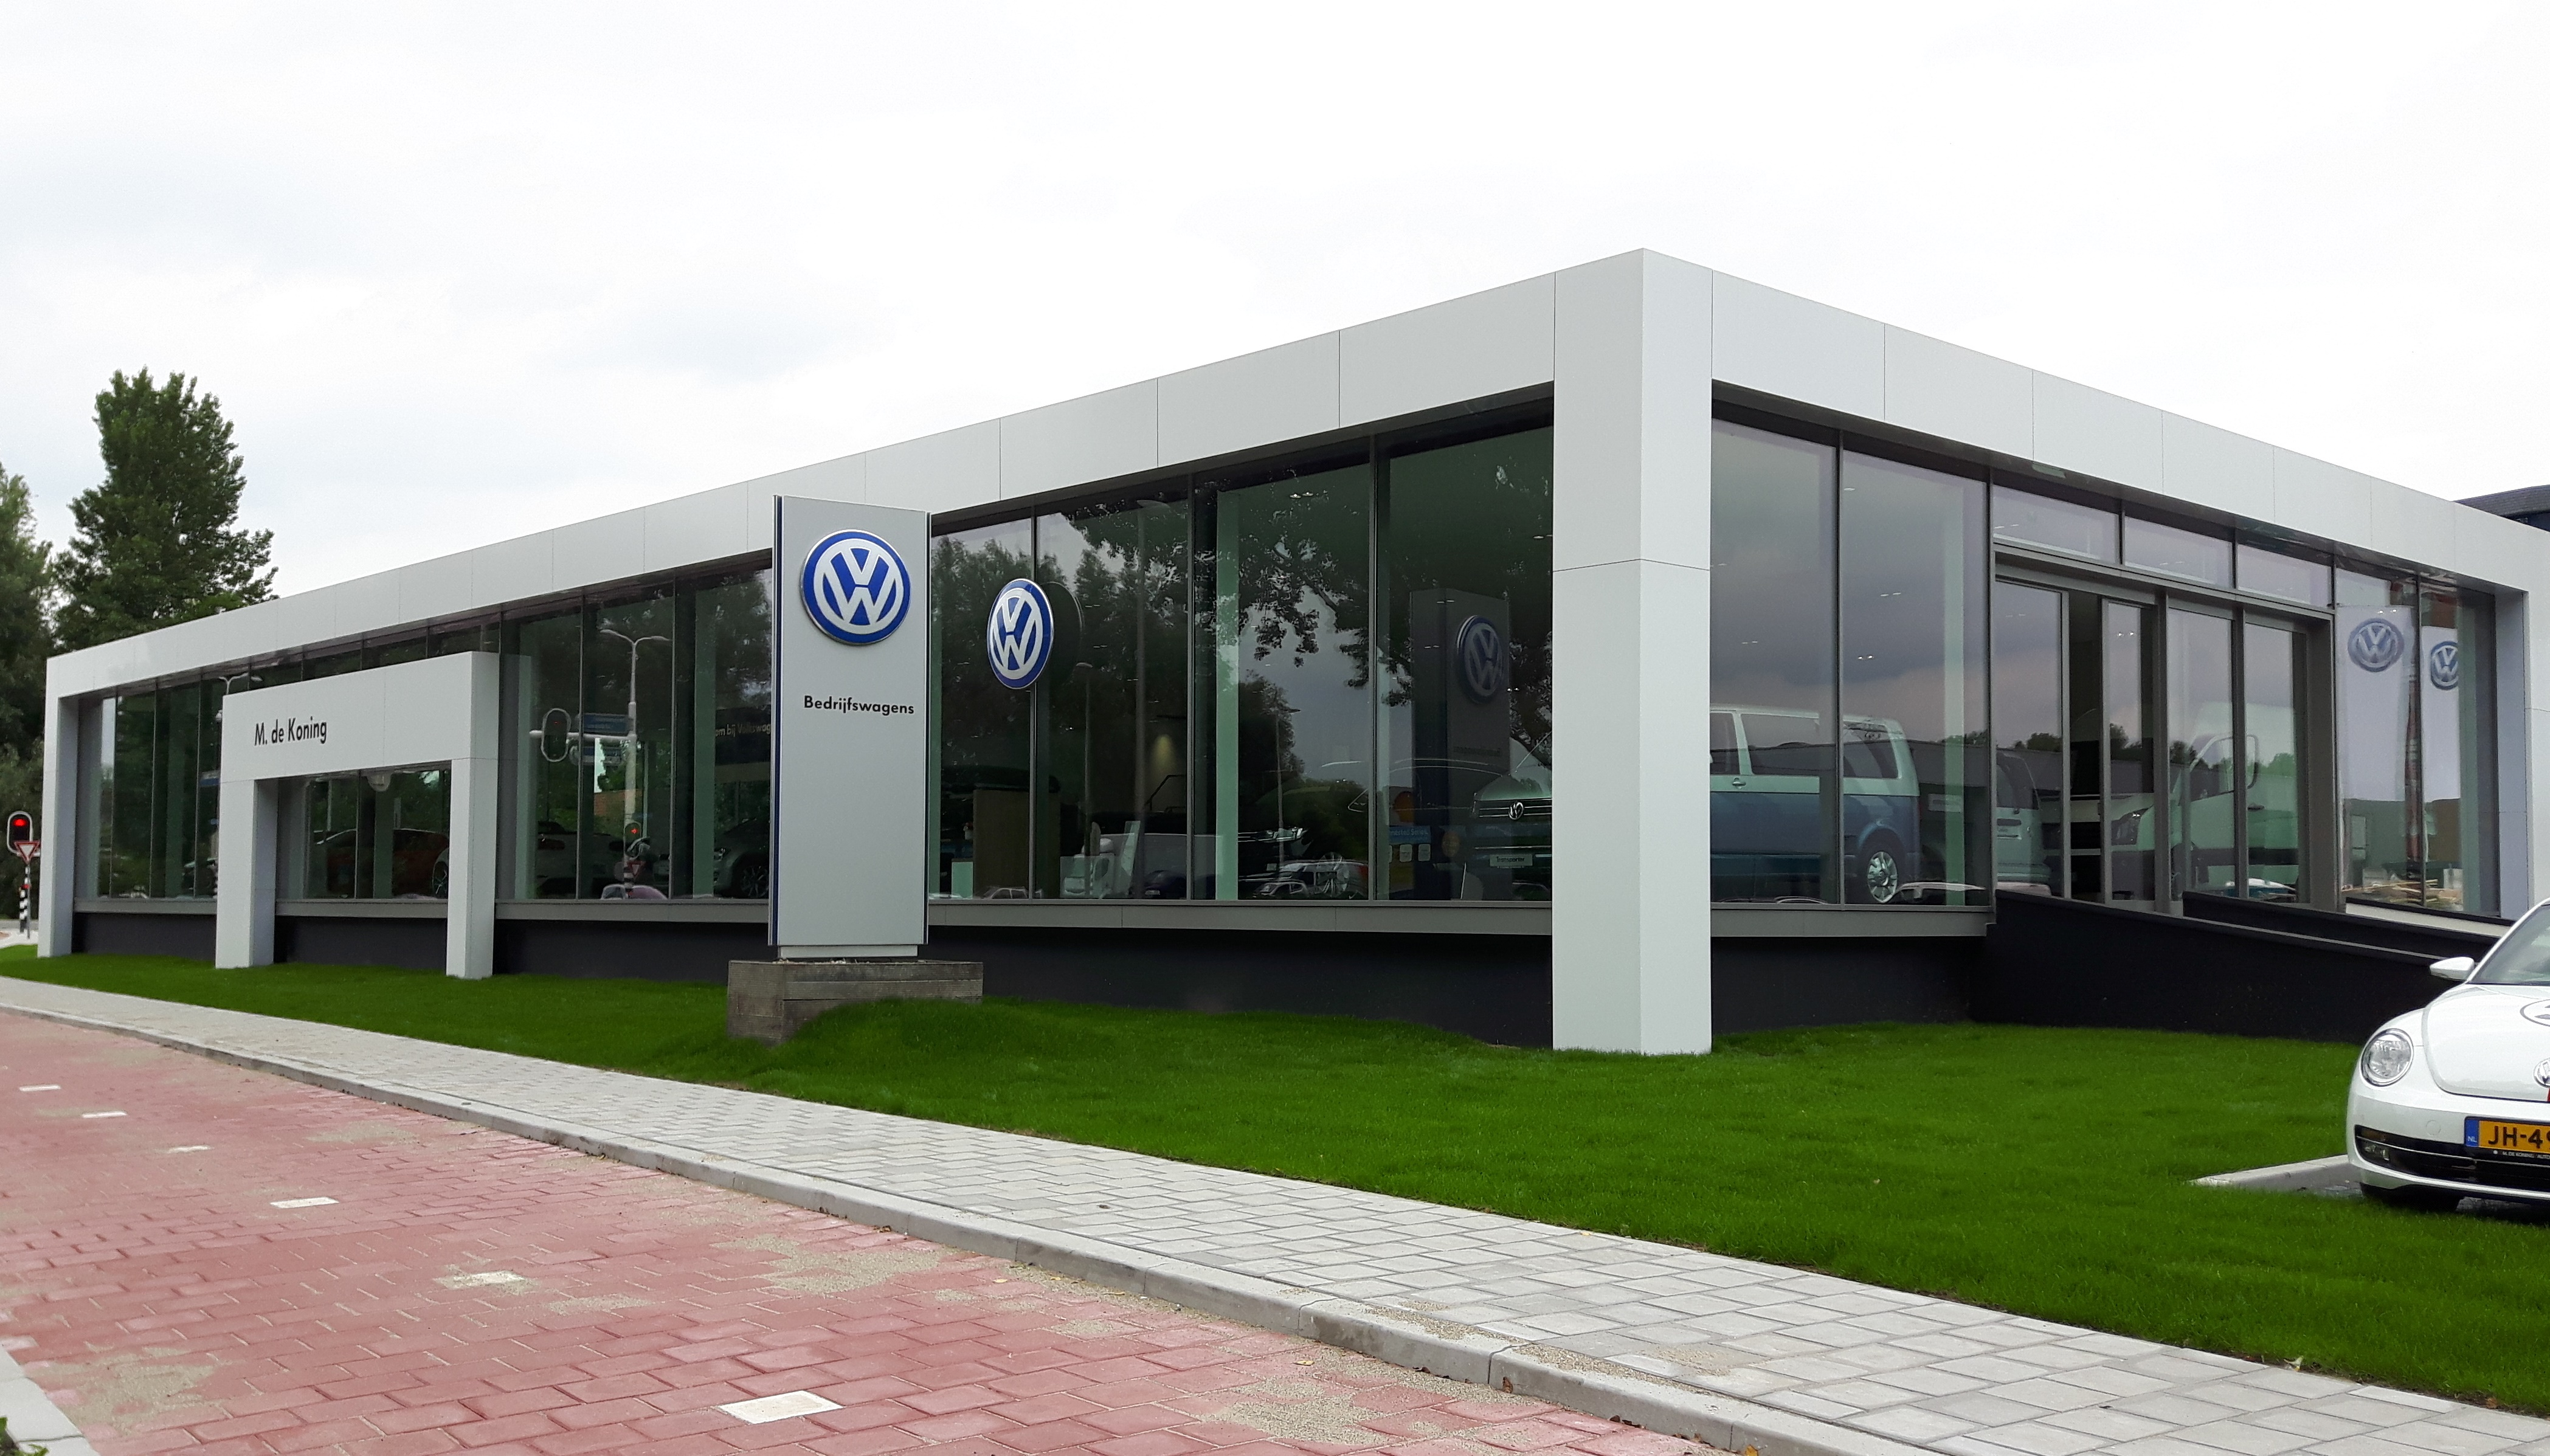 Gevelbekleding: VW De Koning